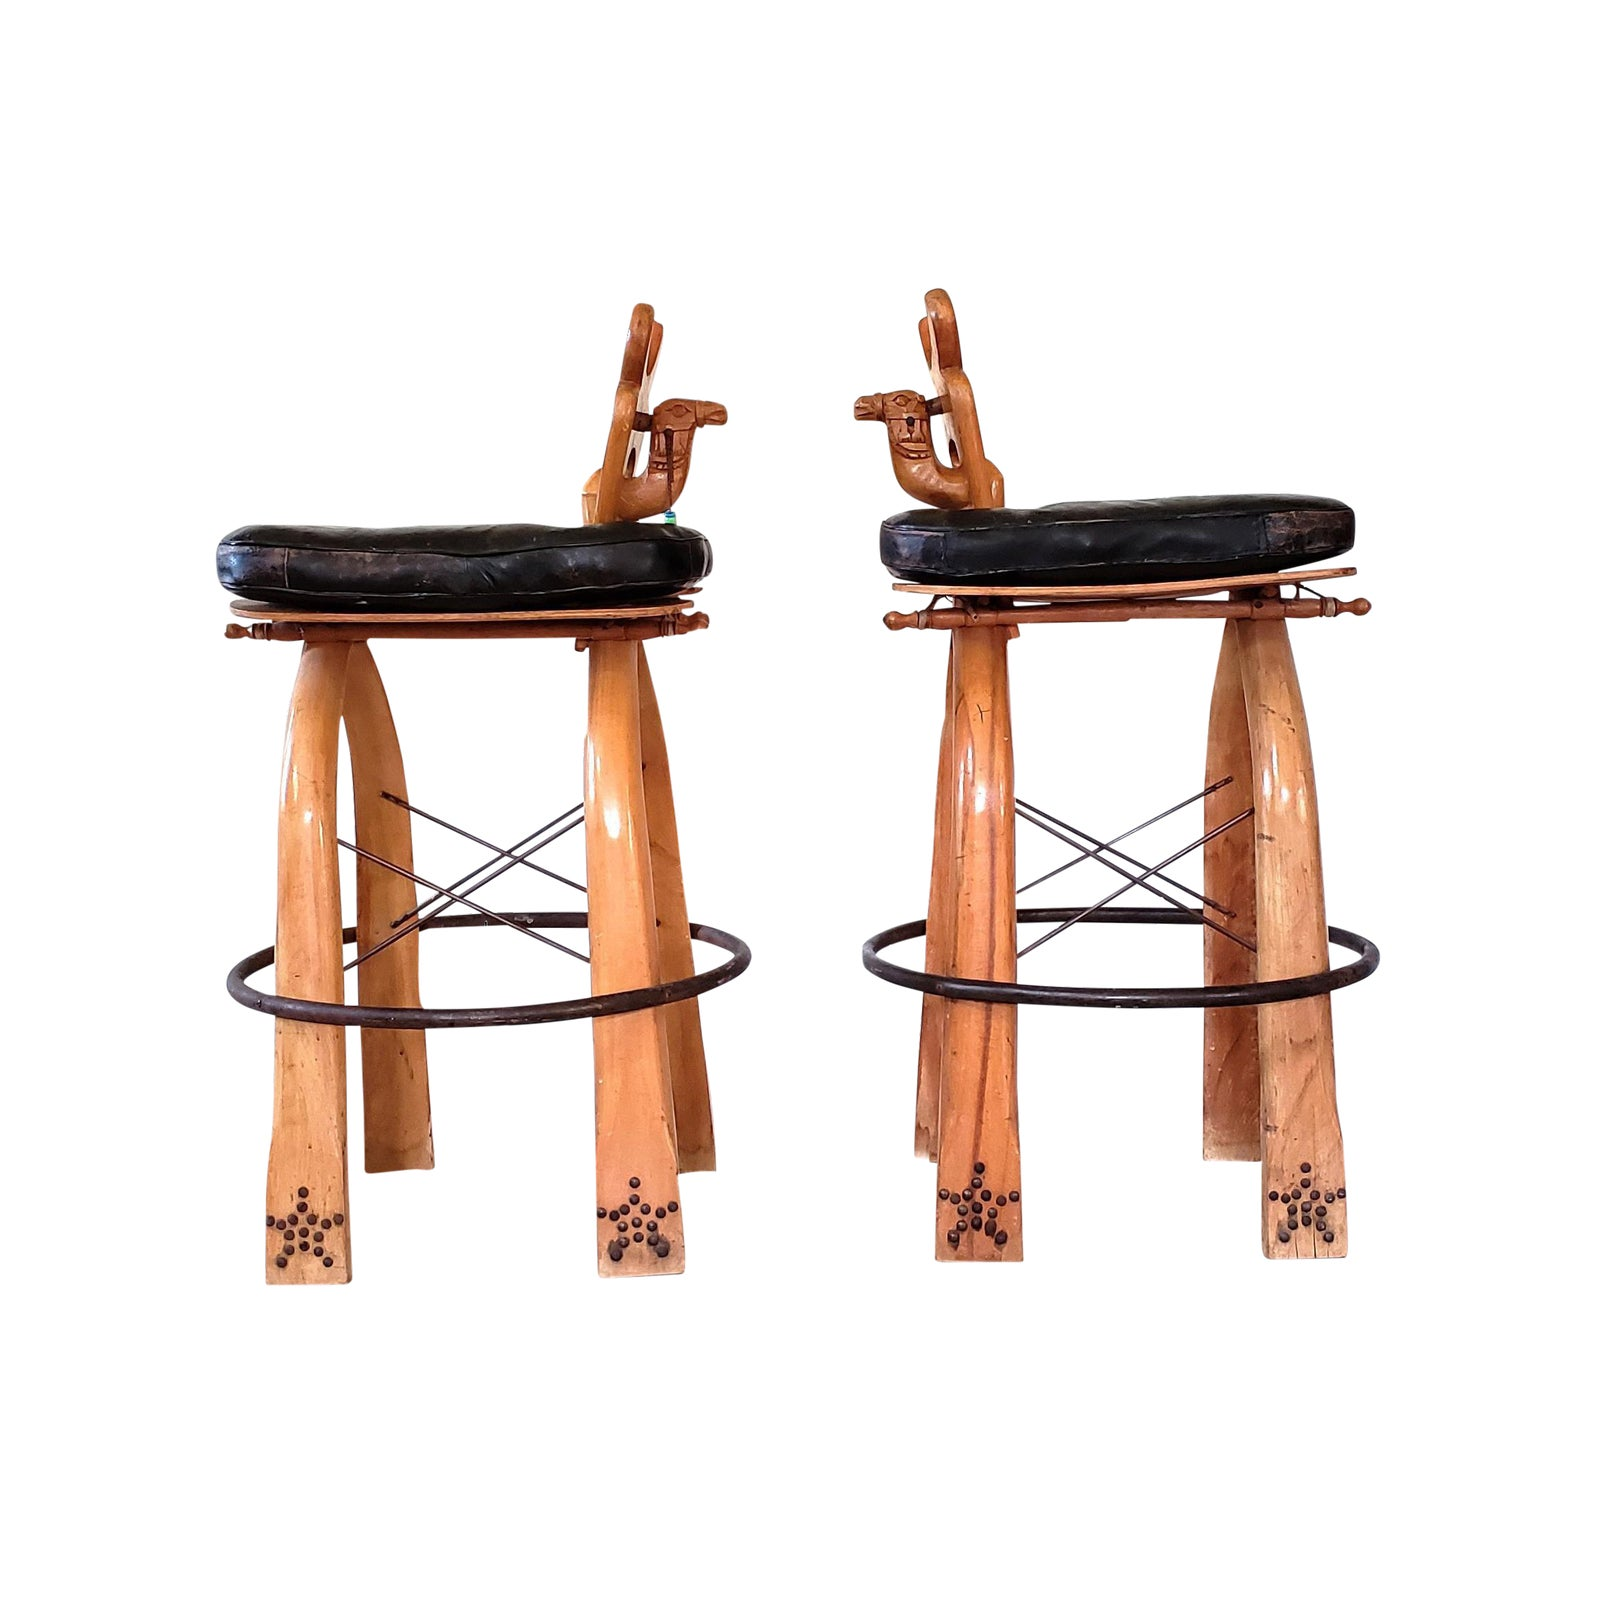 Turkish Wood Camel Saddle Stools A Pair Chairish